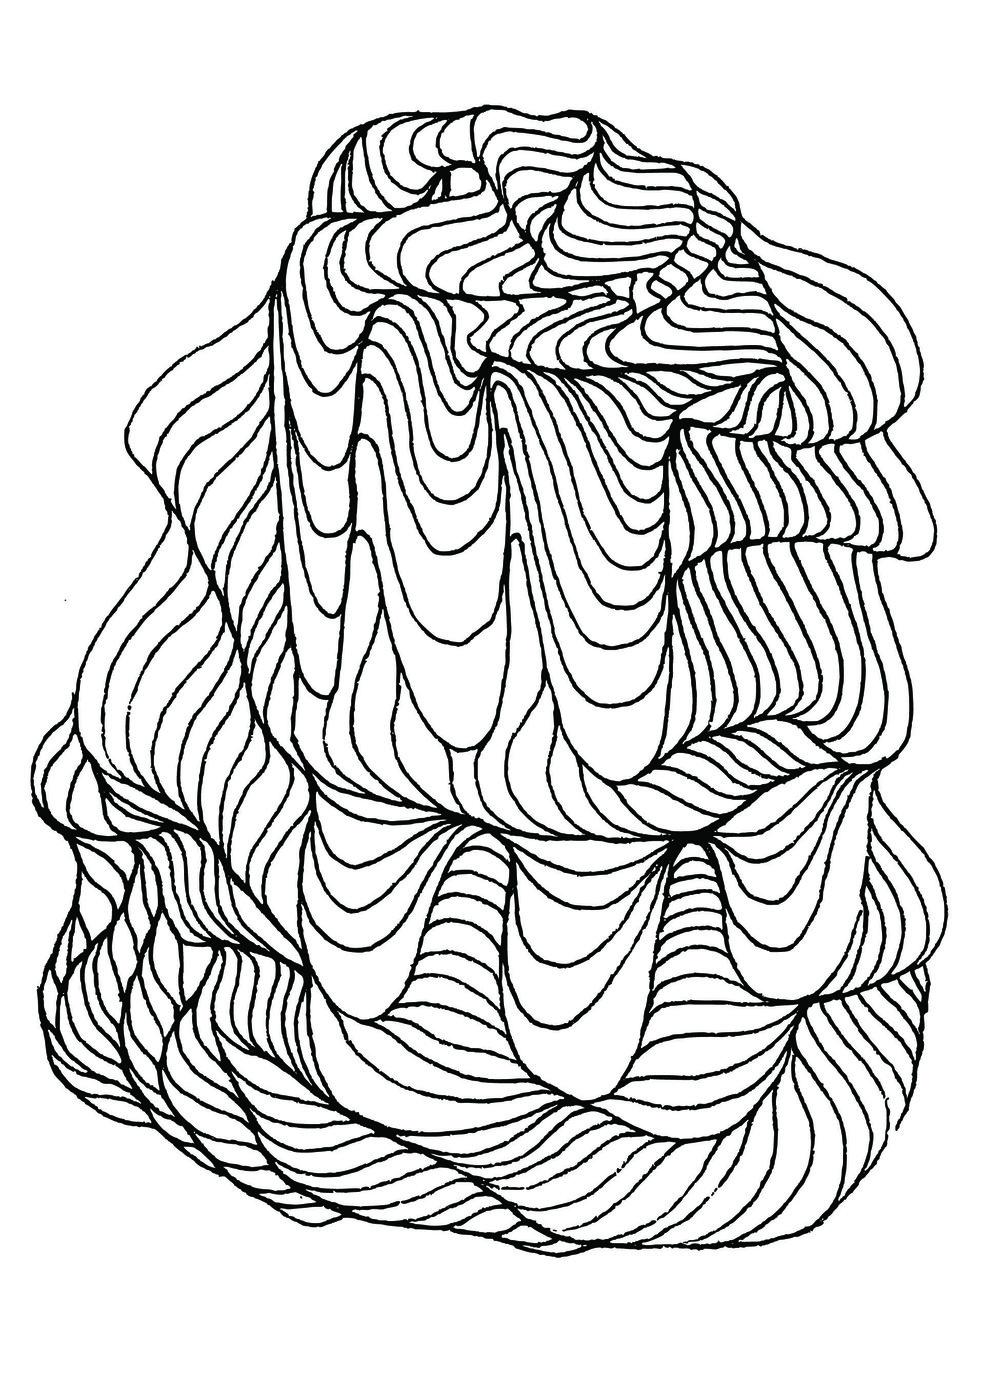 doodles089 copy.jpg